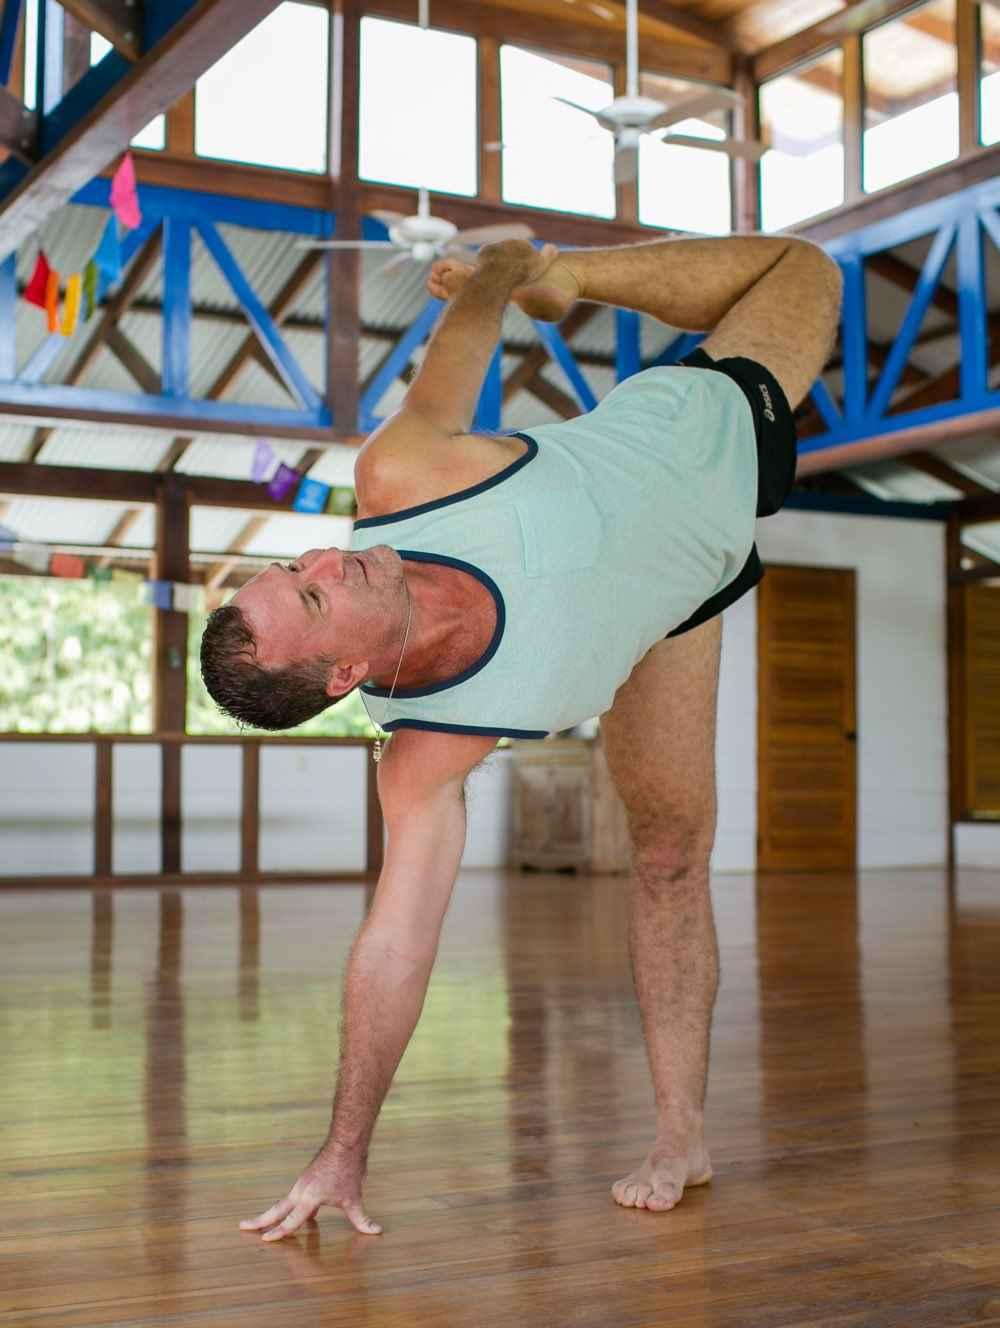 yogi aaron at blue osa practicing yoga